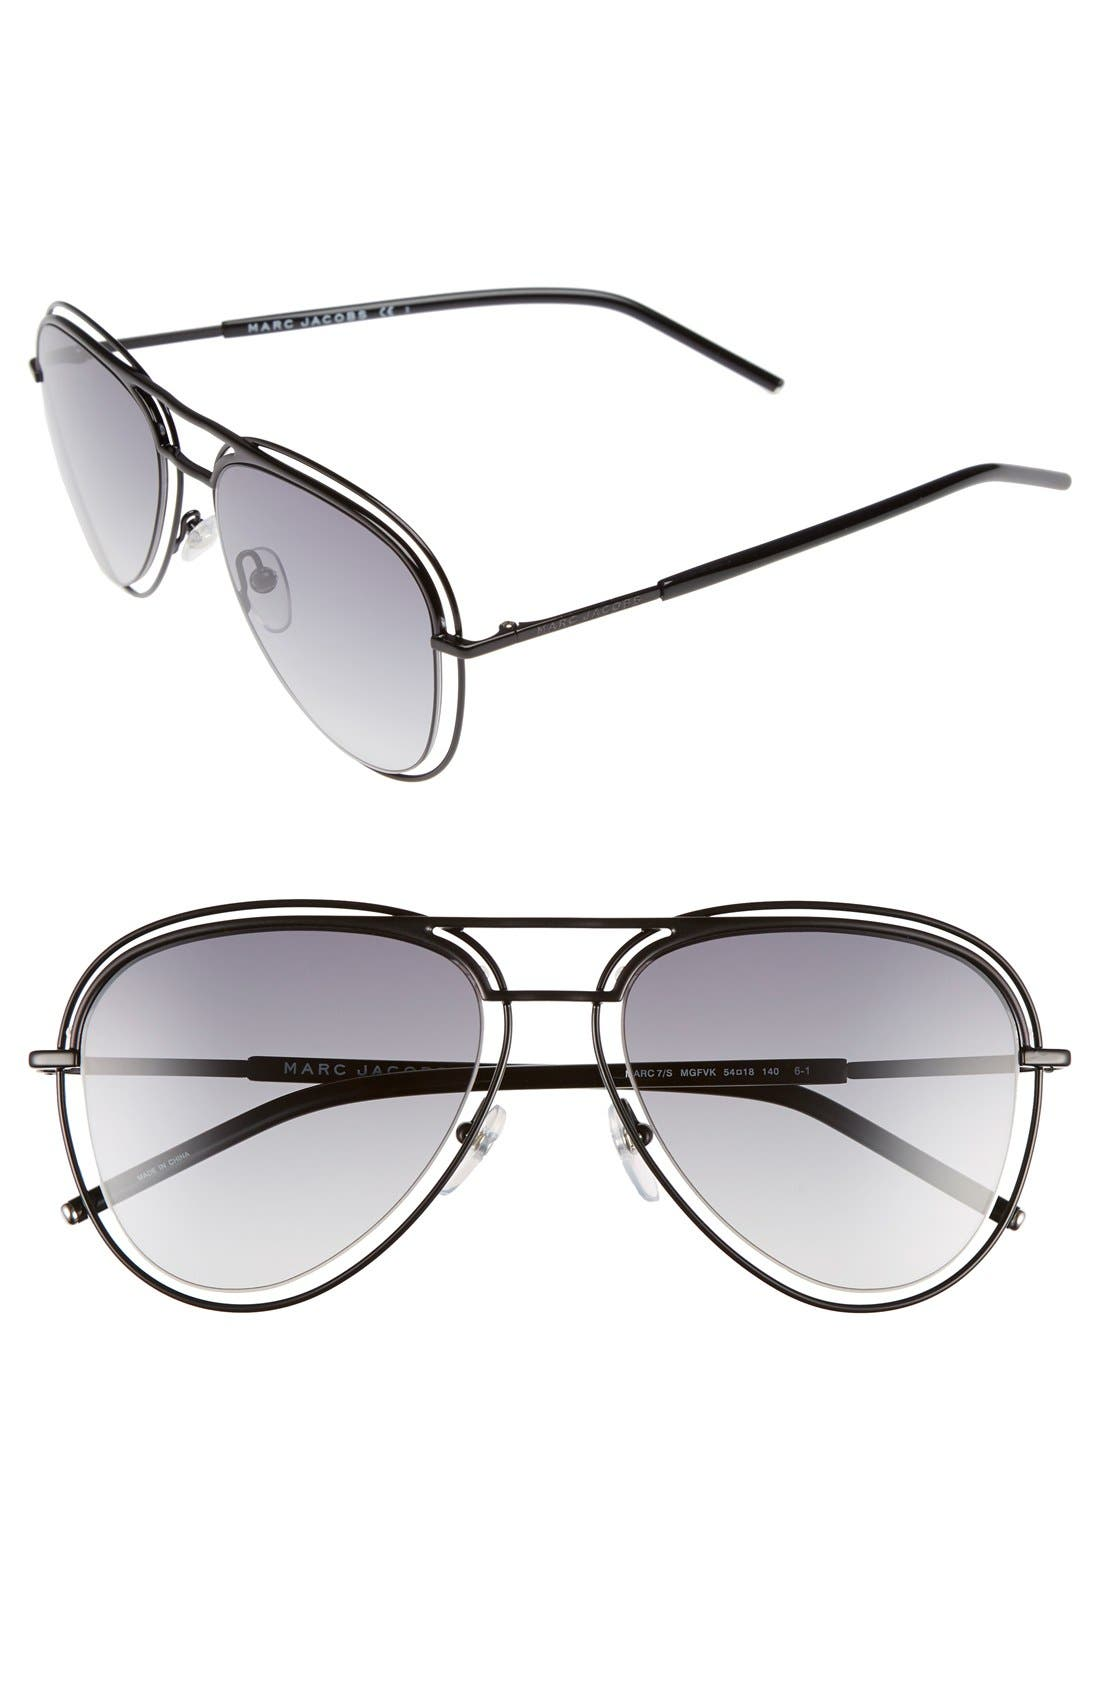 54mm Aviator Sunglasses,                         Main,                         color, Shiny Black